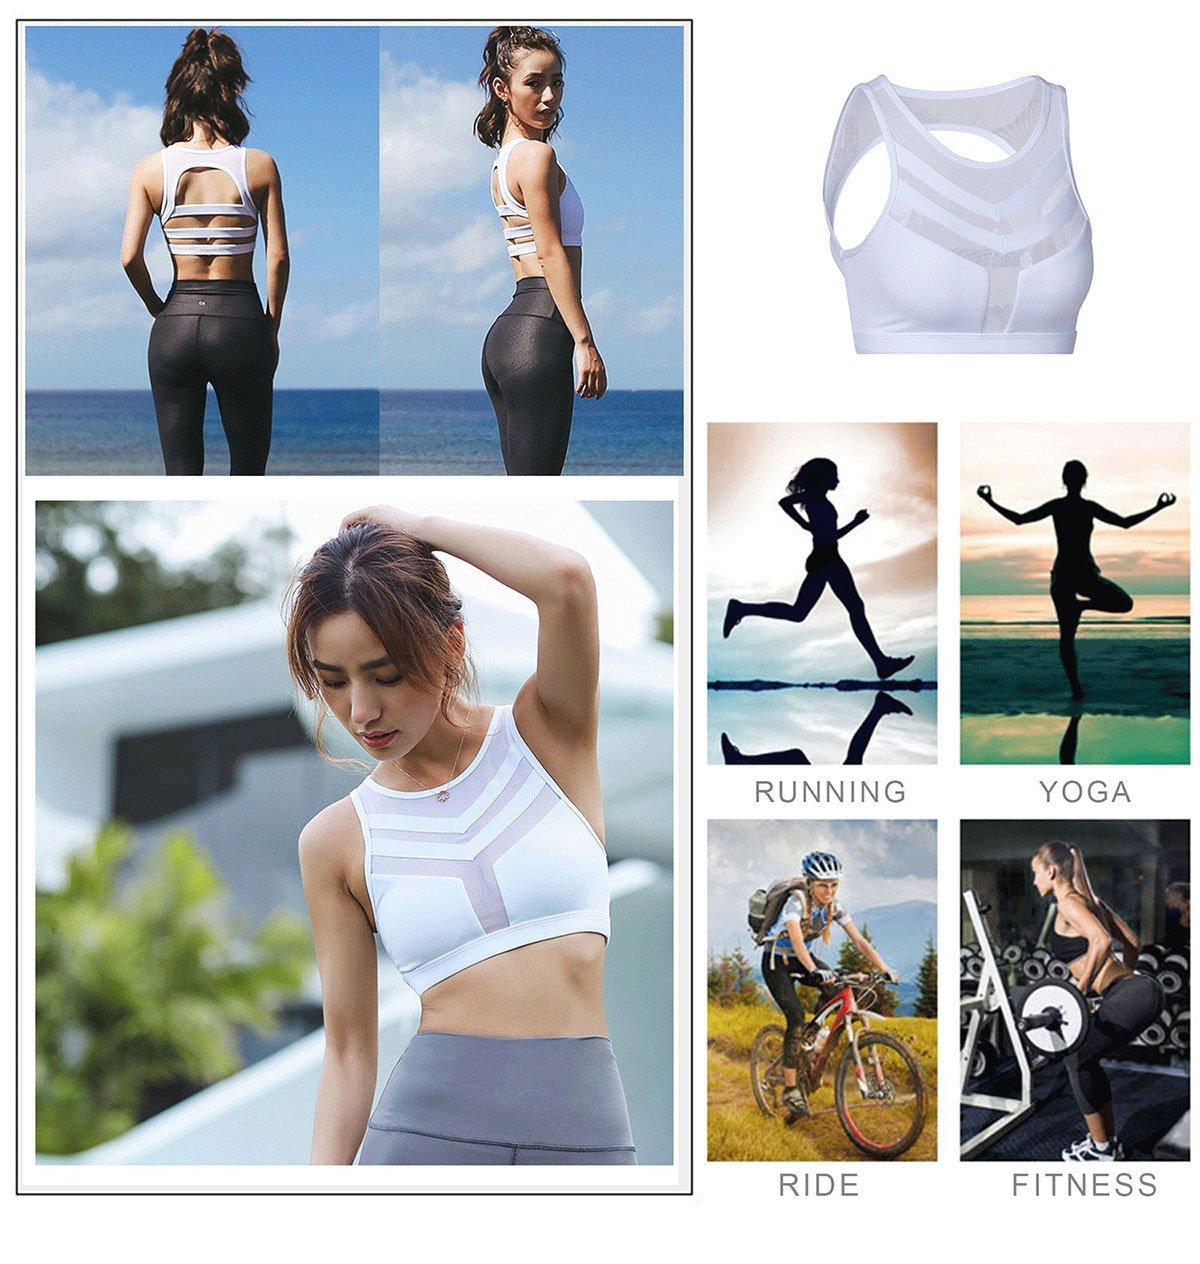 Light&Leaf Women's High Impact Padded Open Back Yoga Sports Bra Crop Tank Top by Light&Leaf (Image #4)